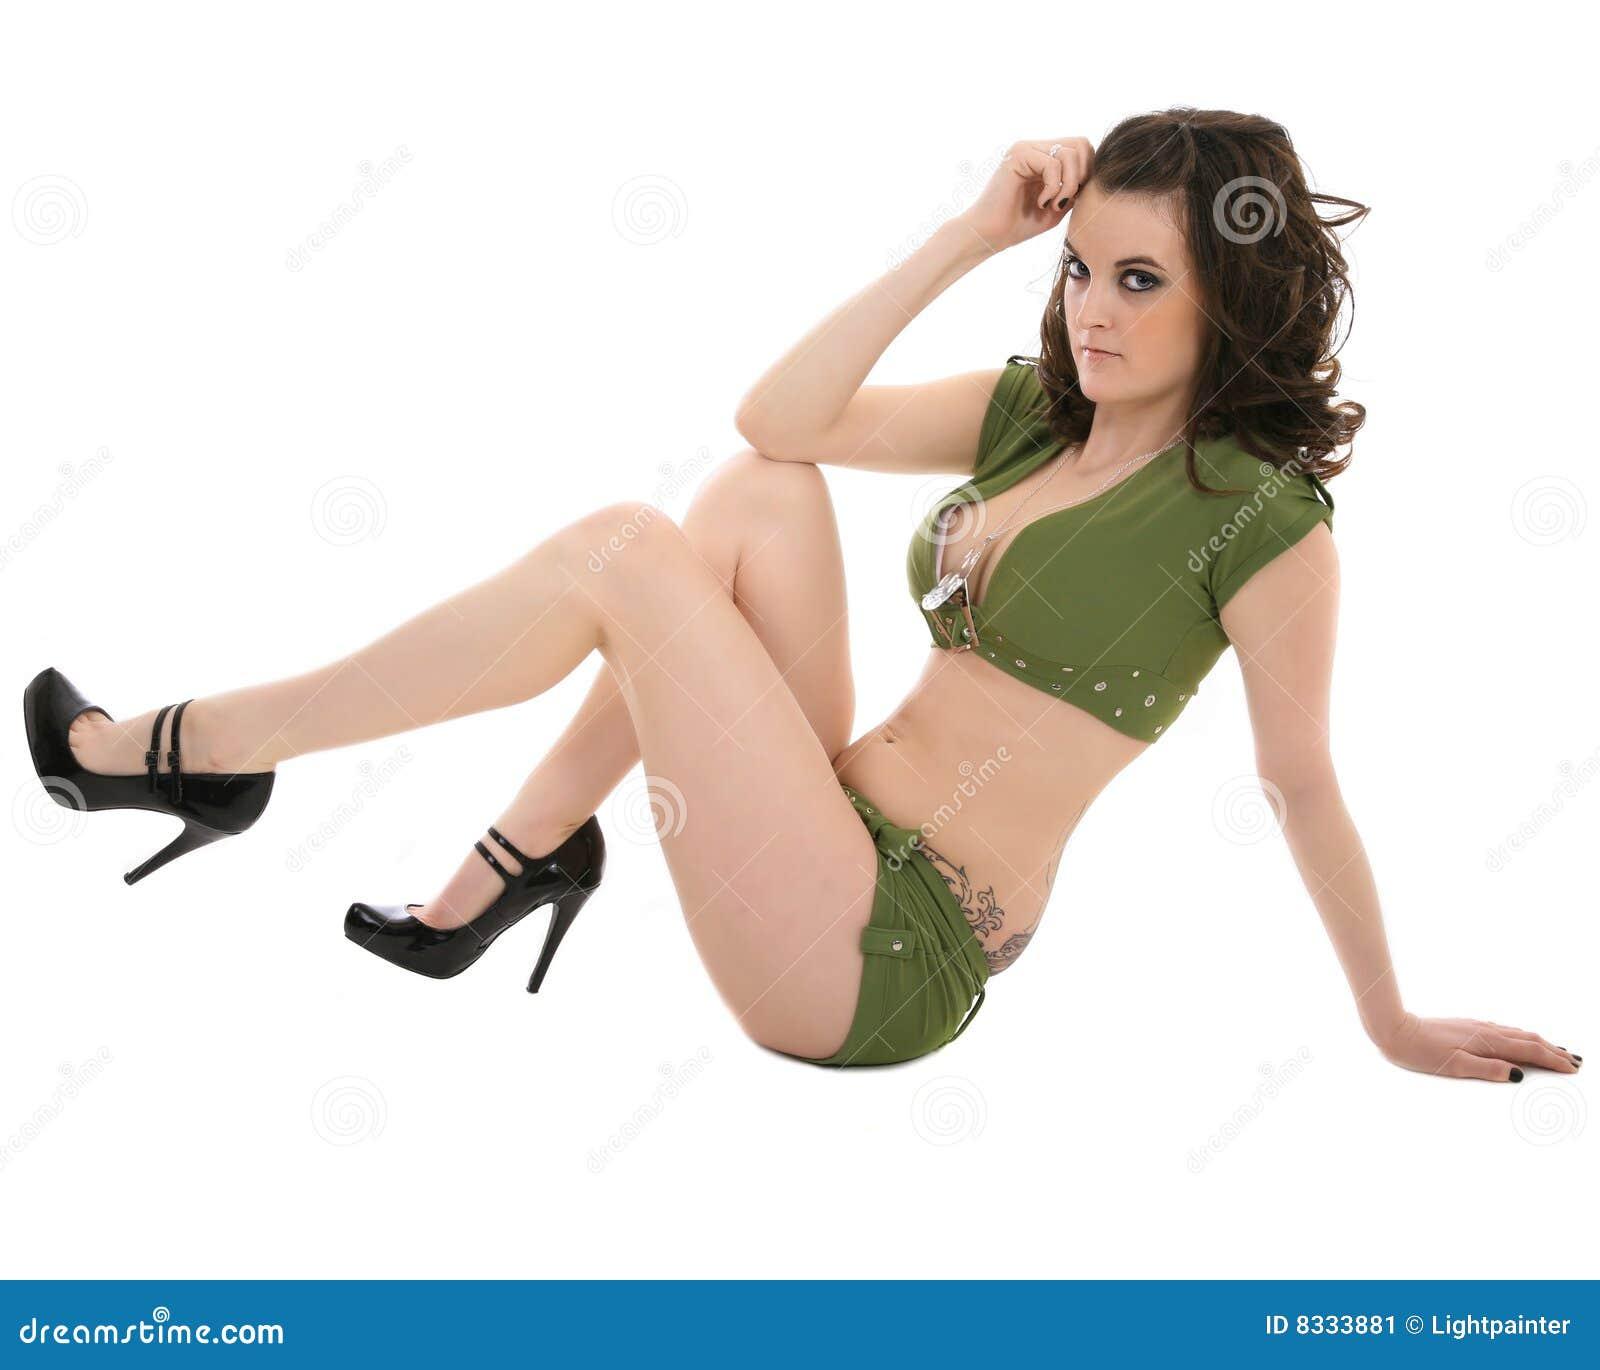 Pin Up Model Hochglanz Erotikfoto Frau nackt 4x